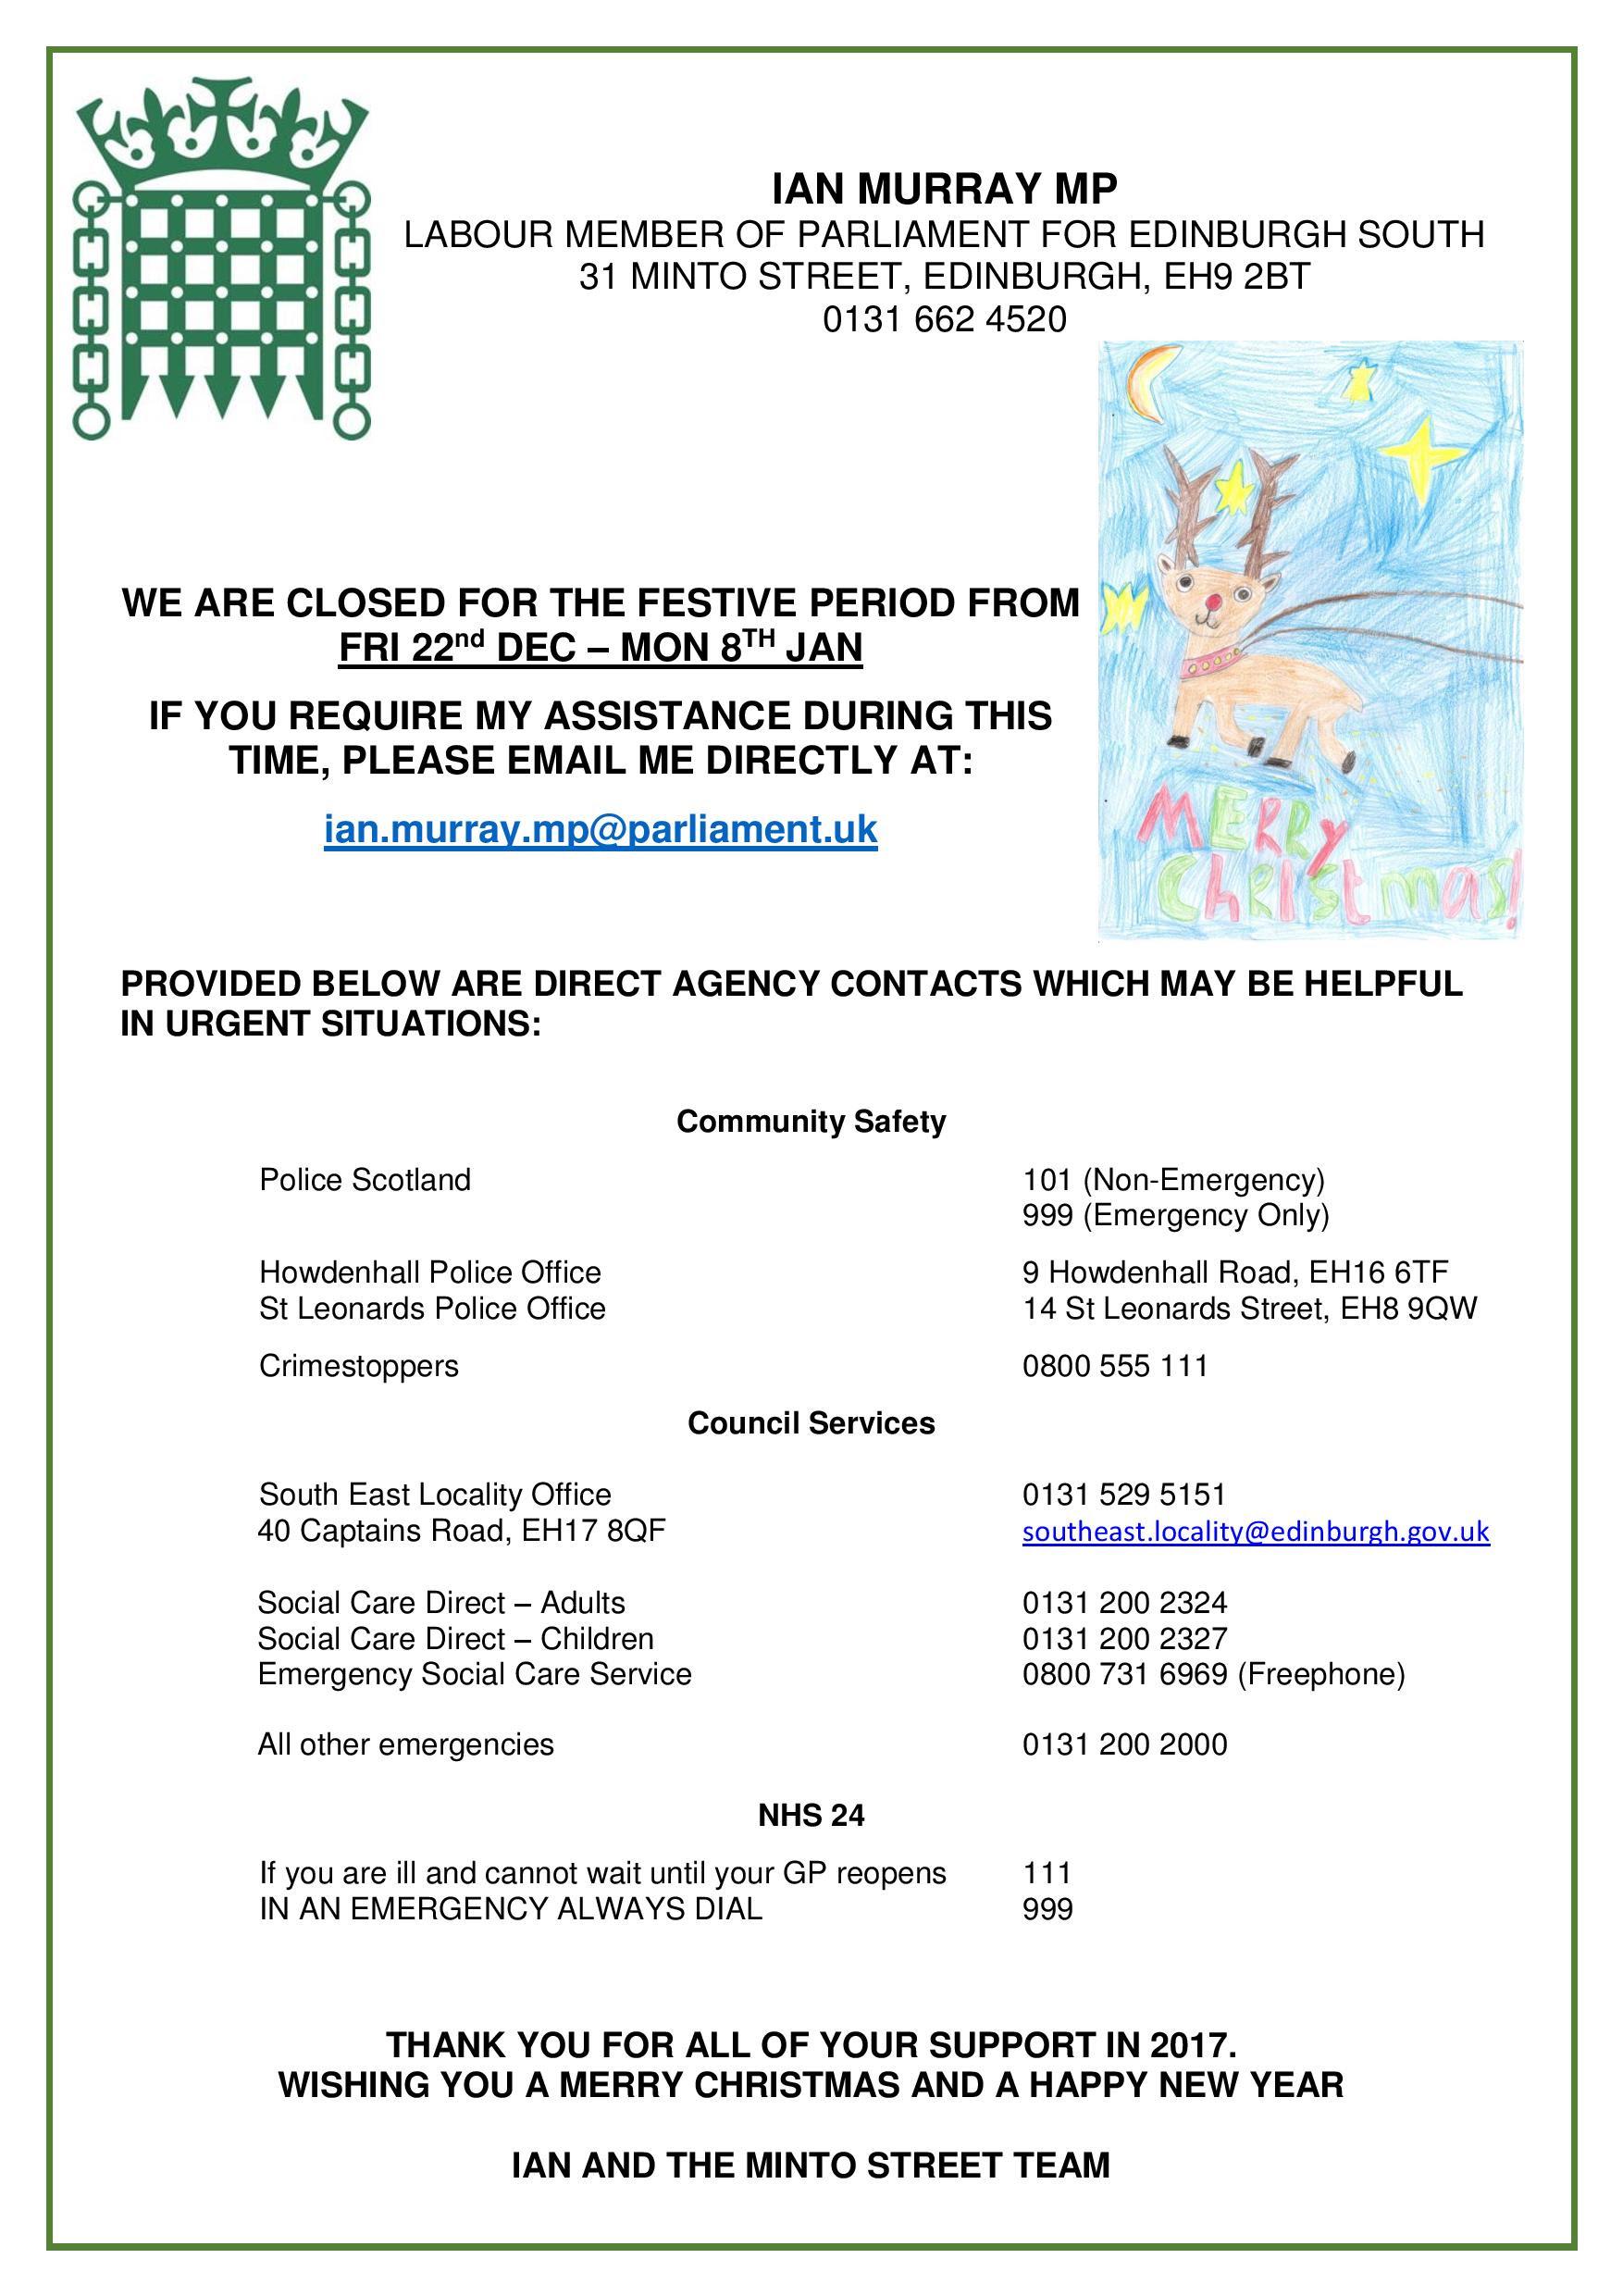 CHRISTMAS_POSTER_2017_ver2-page-001.jpg